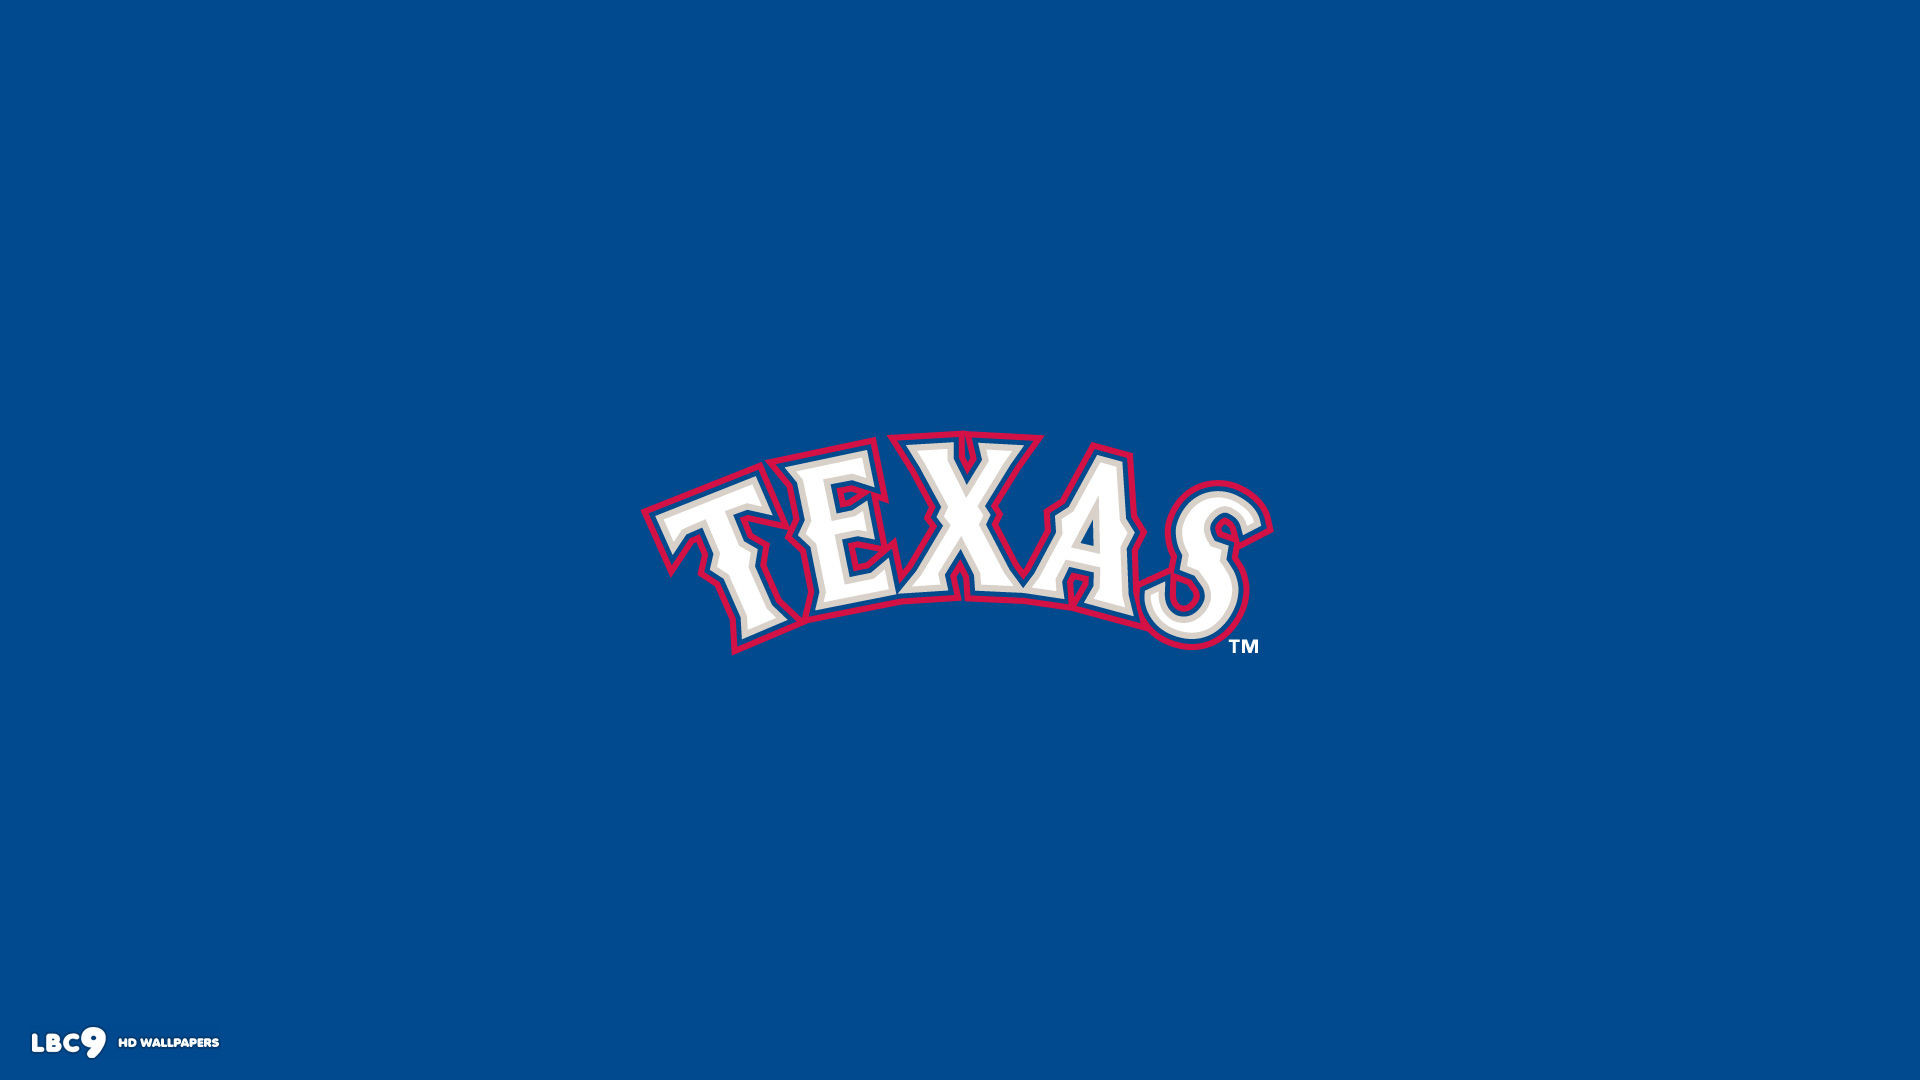 Free Texas Screensavers and Wallpaper   HD Wallpapers   Pinterest   Hd  wallpaper and Wallpaper